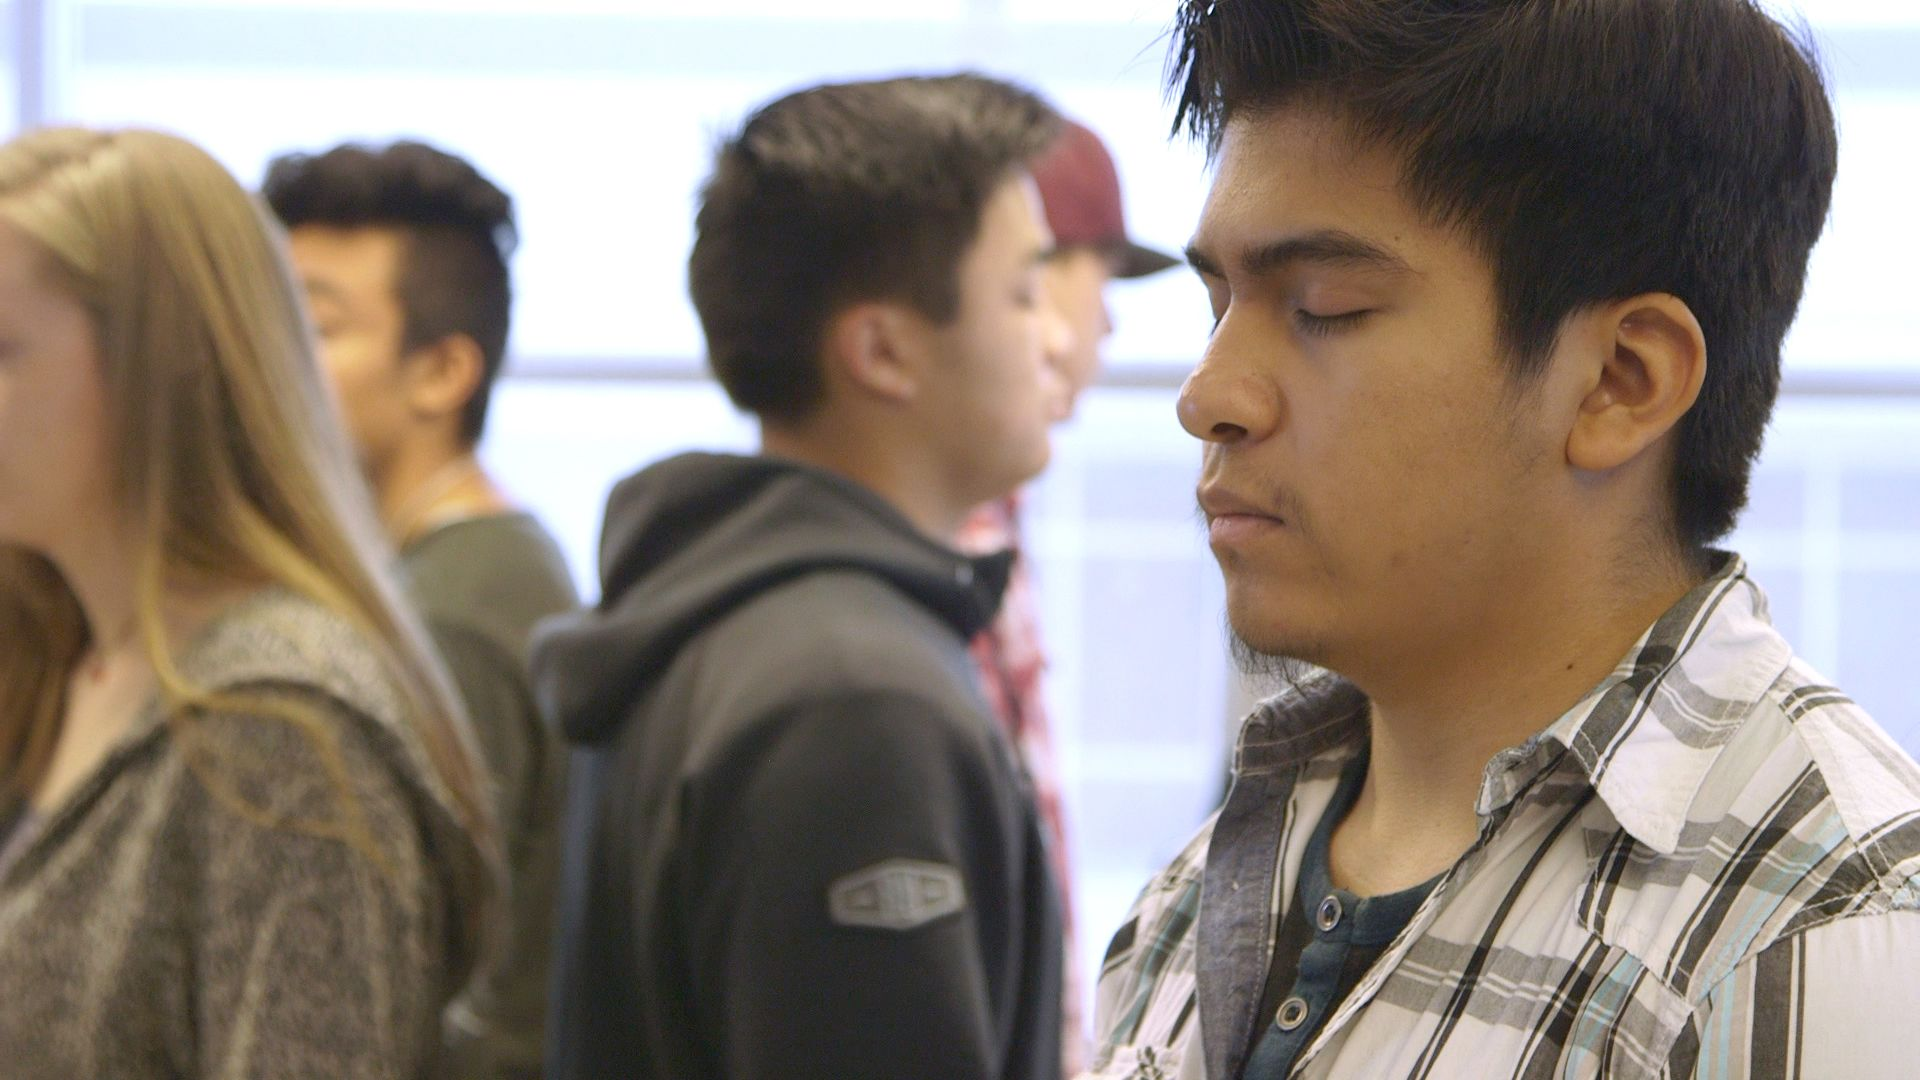 Mindfulness in High School | Edutopia